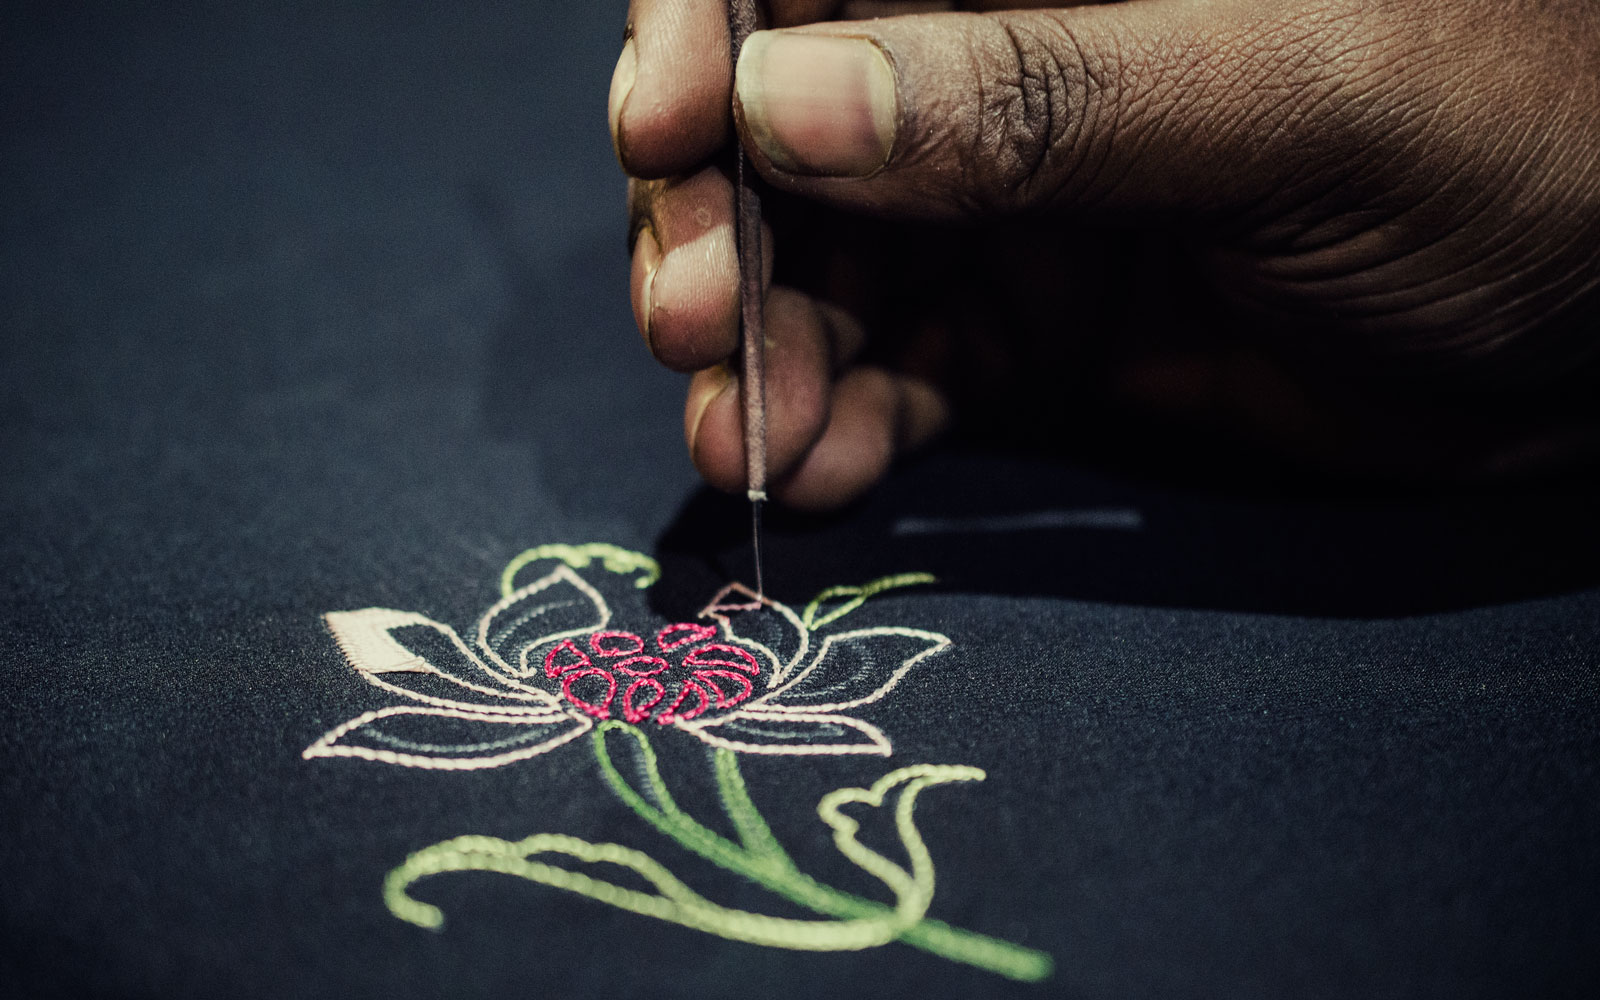 A master craftsman embroiders a Gara sari at designer Ashdeen Lilaowala's studio.